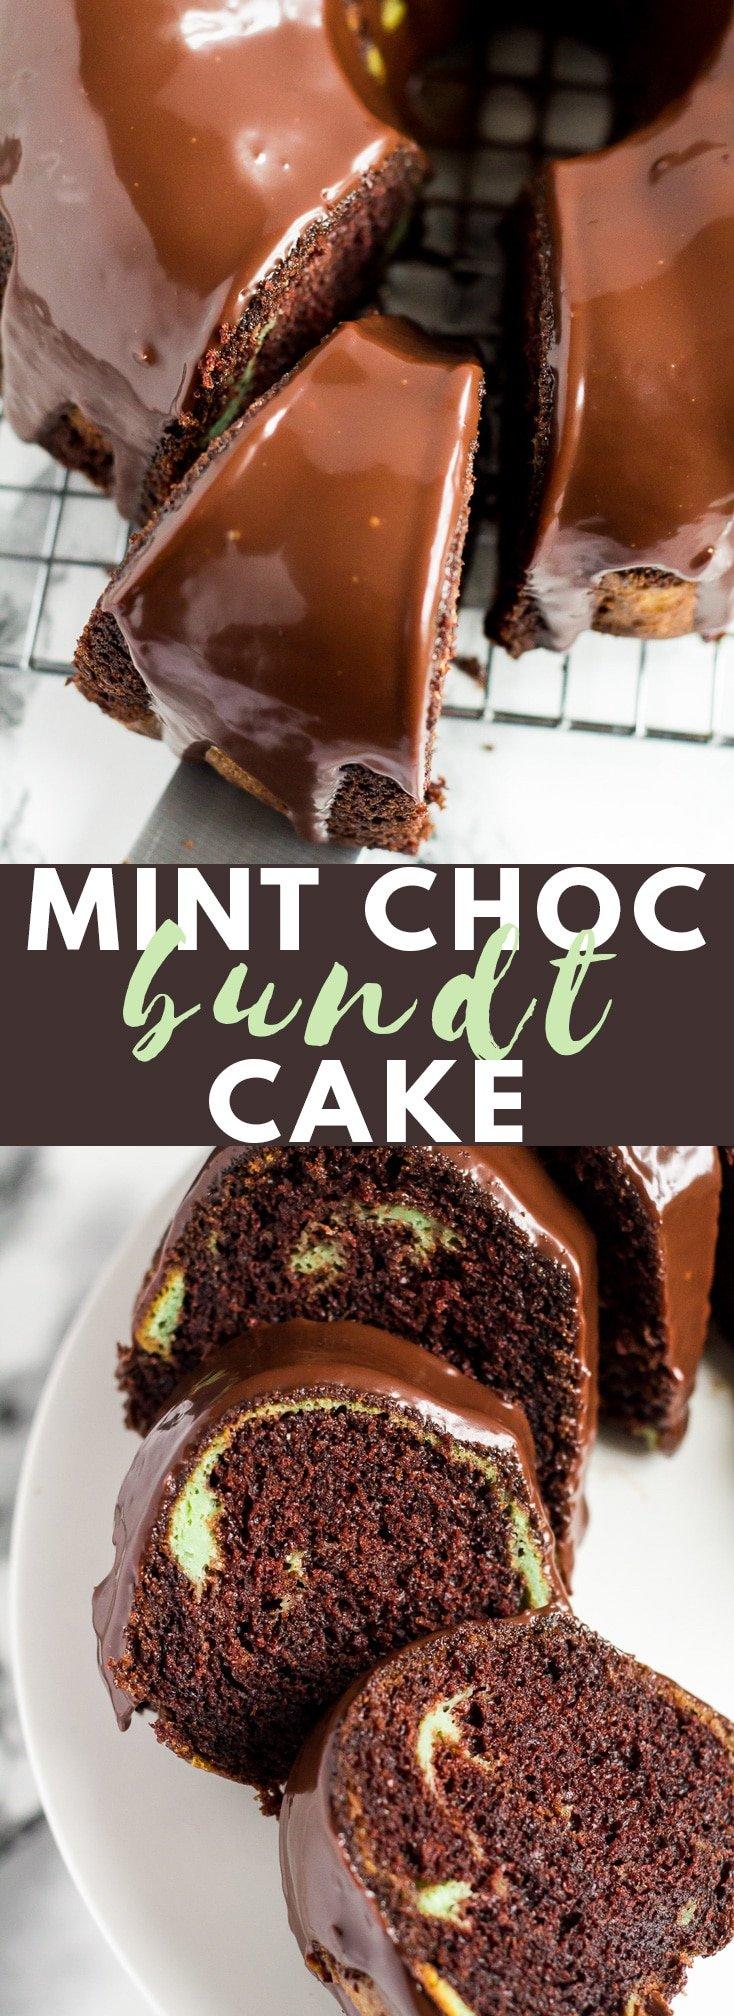 Mint Chocolate Bundt Cake - Deliciously moist and fluffy chocolate bundt cake infused with mint, and drizzled with a creamy chocolate ganache! #mint #chocolate #bundtcake #chocolatecake #cakerecipes